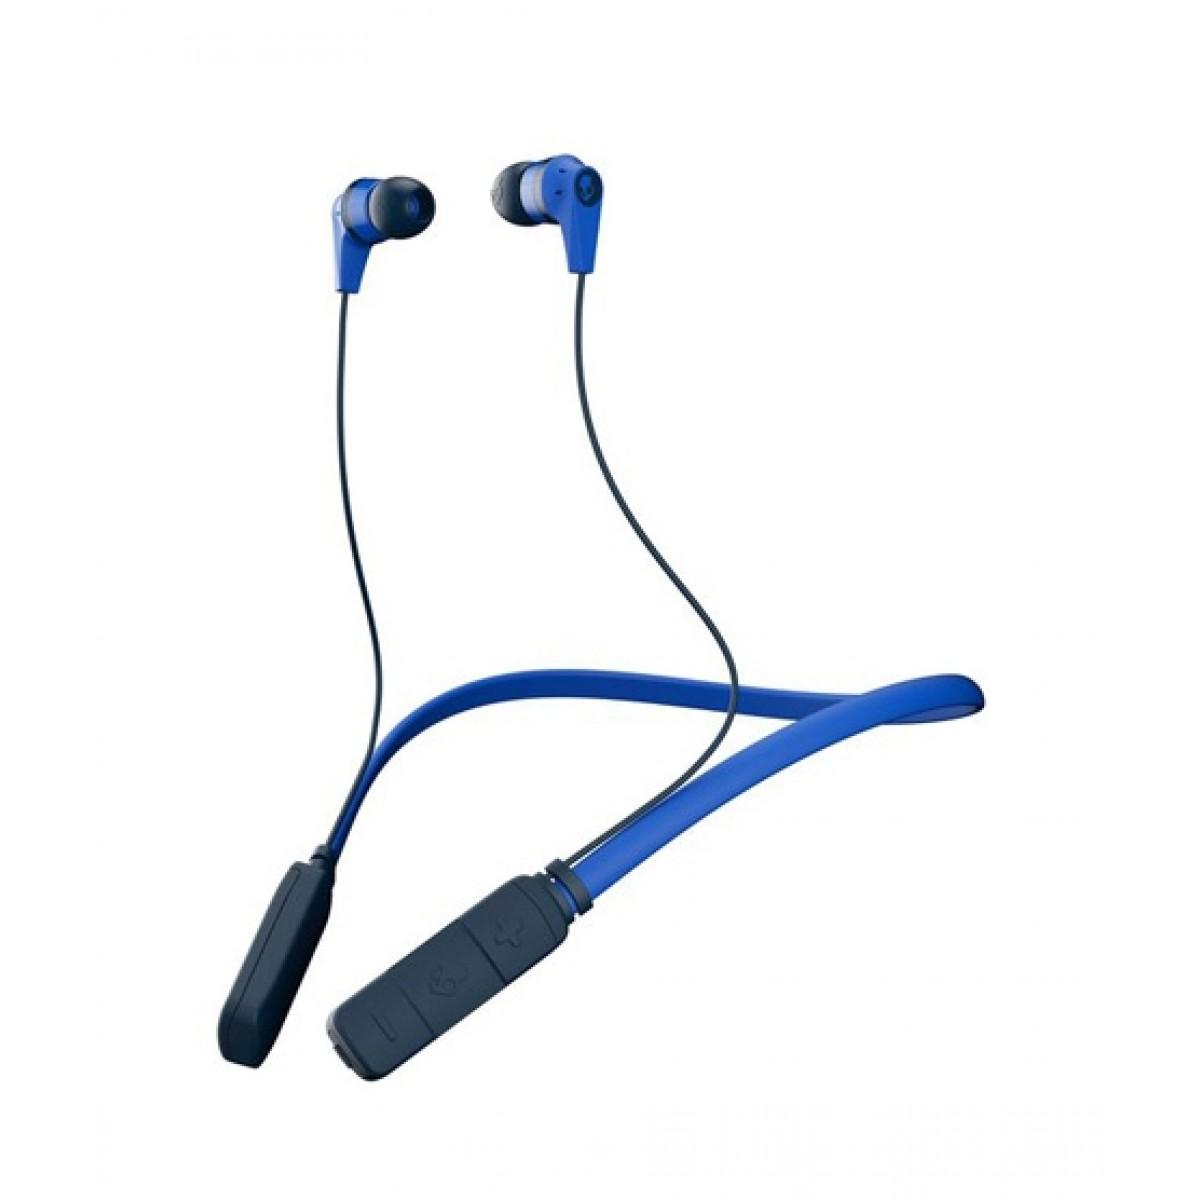 Skullcandy INK'D Wireless In-Ear Headphones with Mic Royal/Navy (S2IKW-J569)